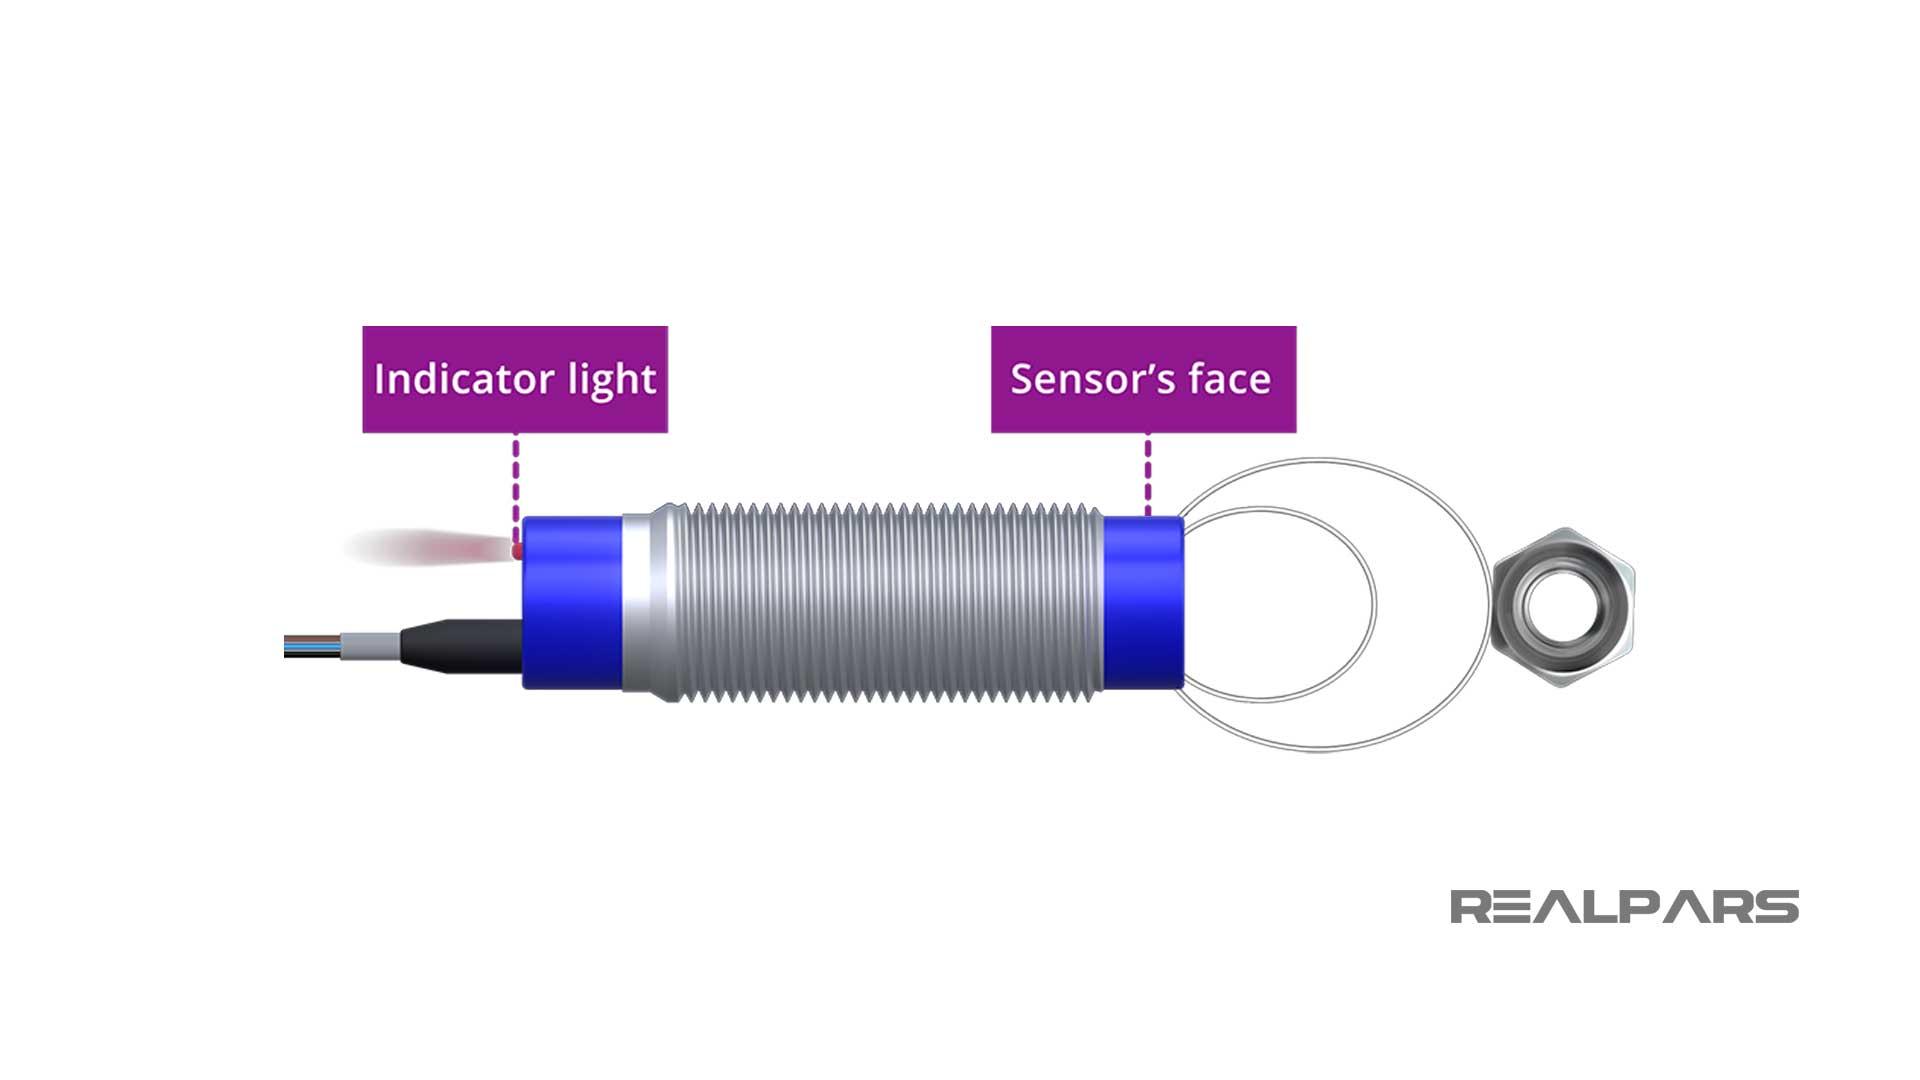 Inductive sensor face and indicator light